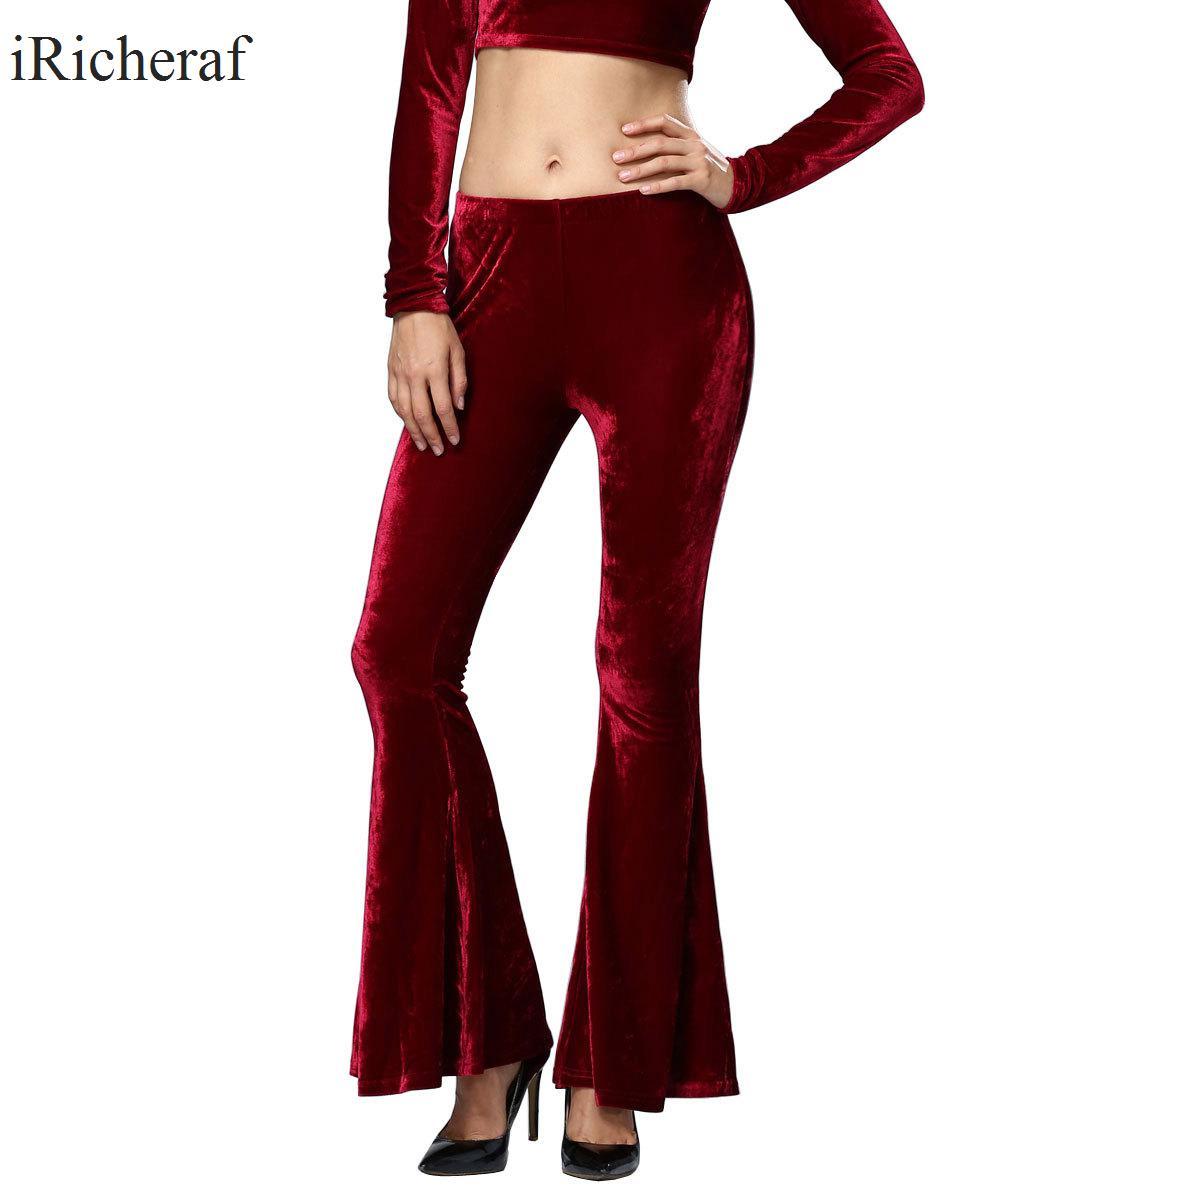 iRicheraf Full Length Flare Pants Women Fashion Solid Slim Casual Pant Female Ladies Trousers Feminino Hot Sale Autumn Clothing